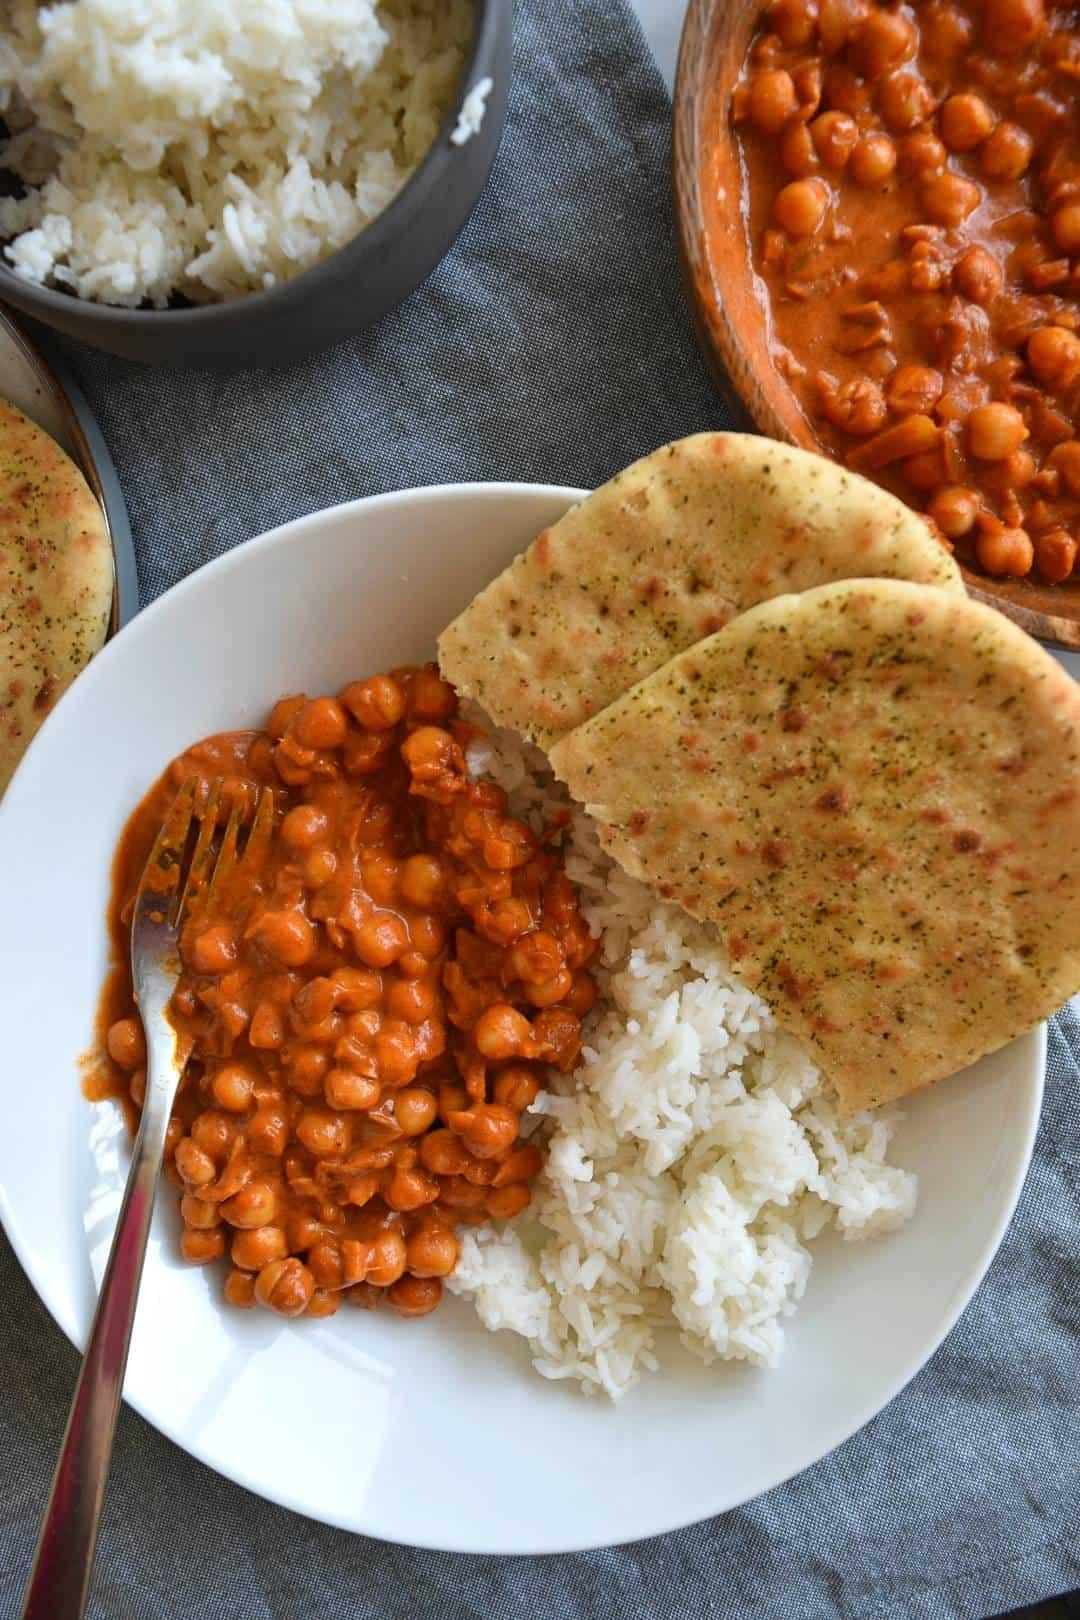 Chana masala, rice and naan bread in a bowl.